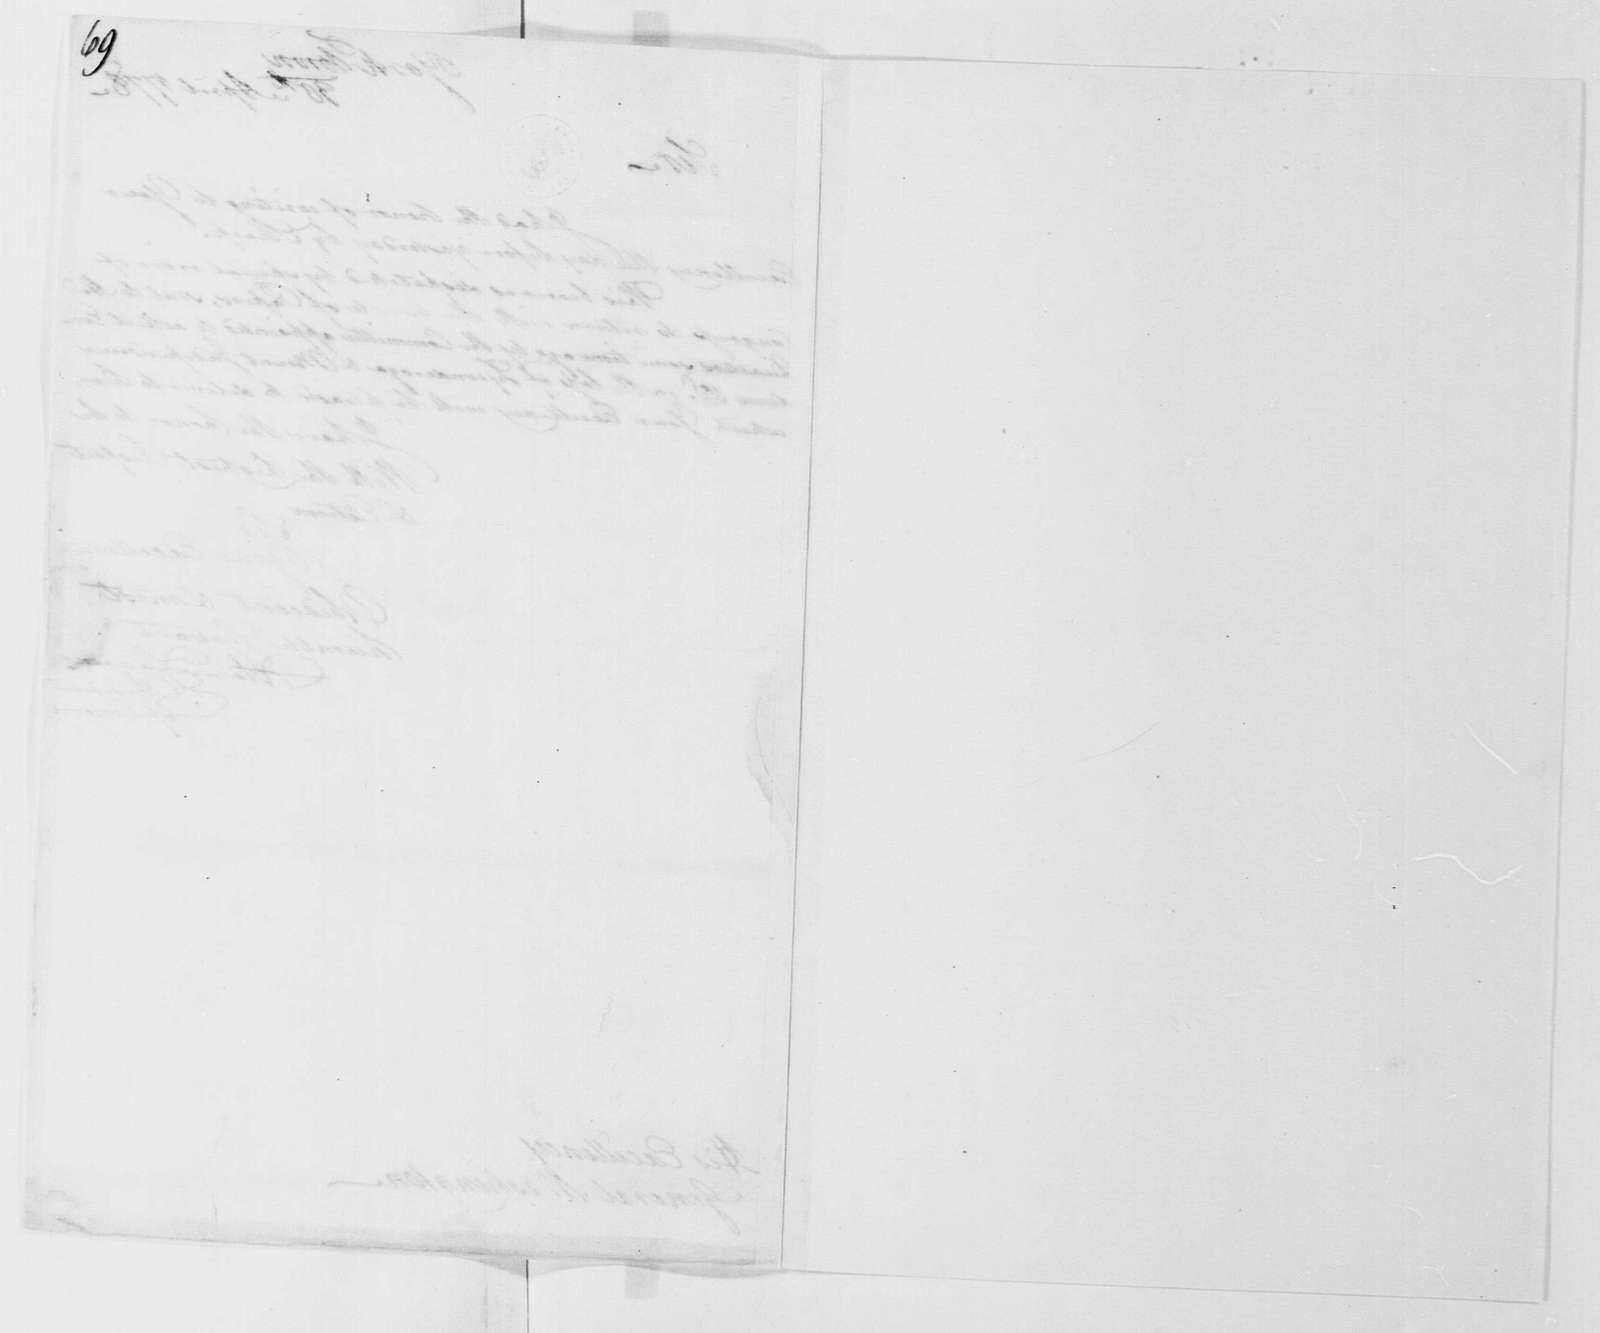 George Washington Papers, Series 4, General Correspondence: Continental Congress to George Washington, April 30, 1778